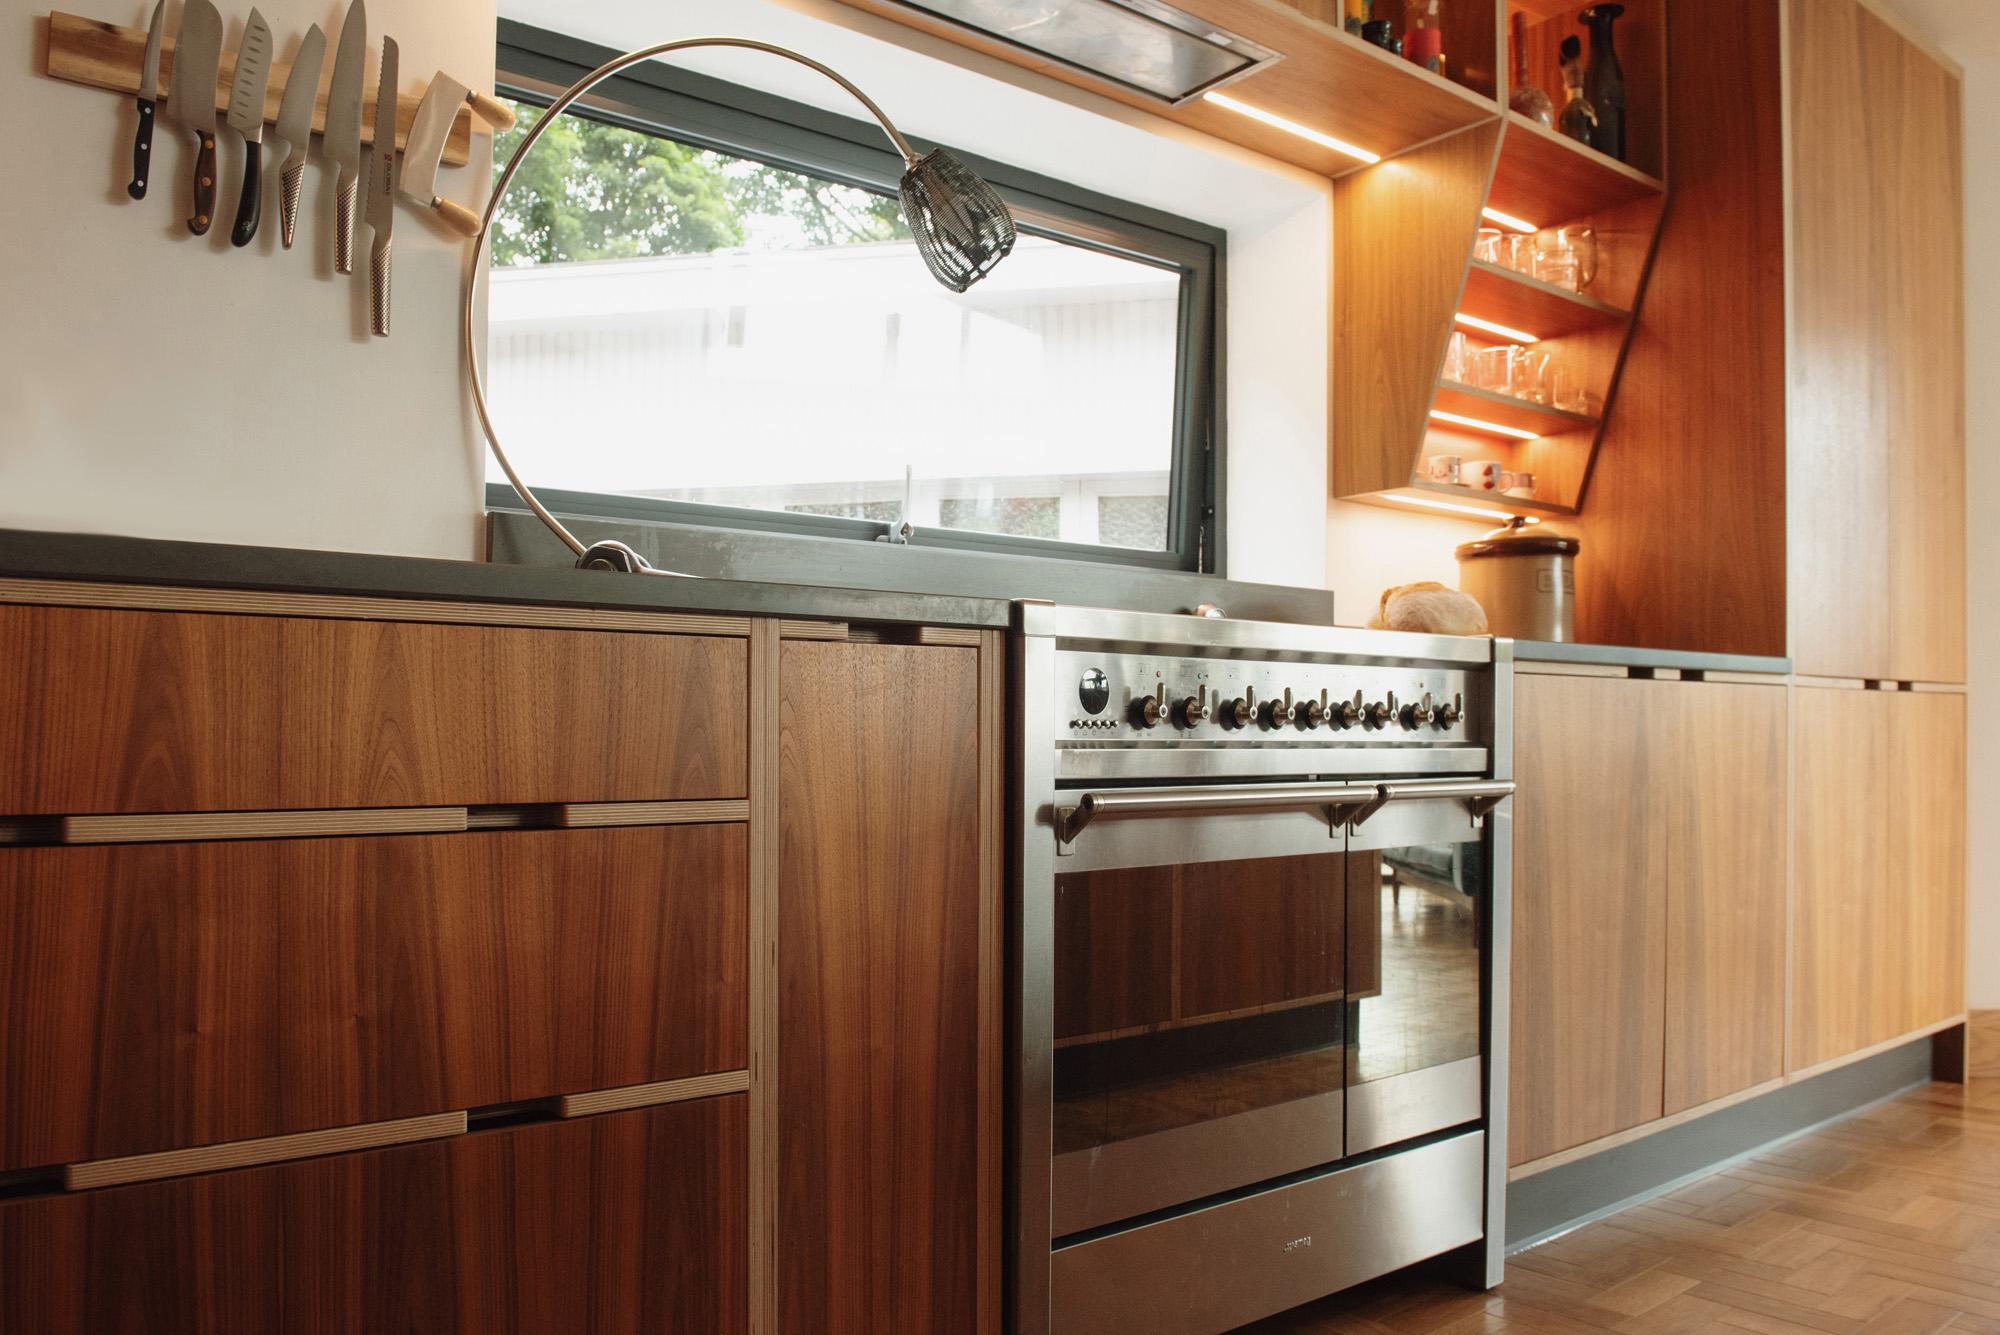 walnut kitchen with stainless steel range cooker